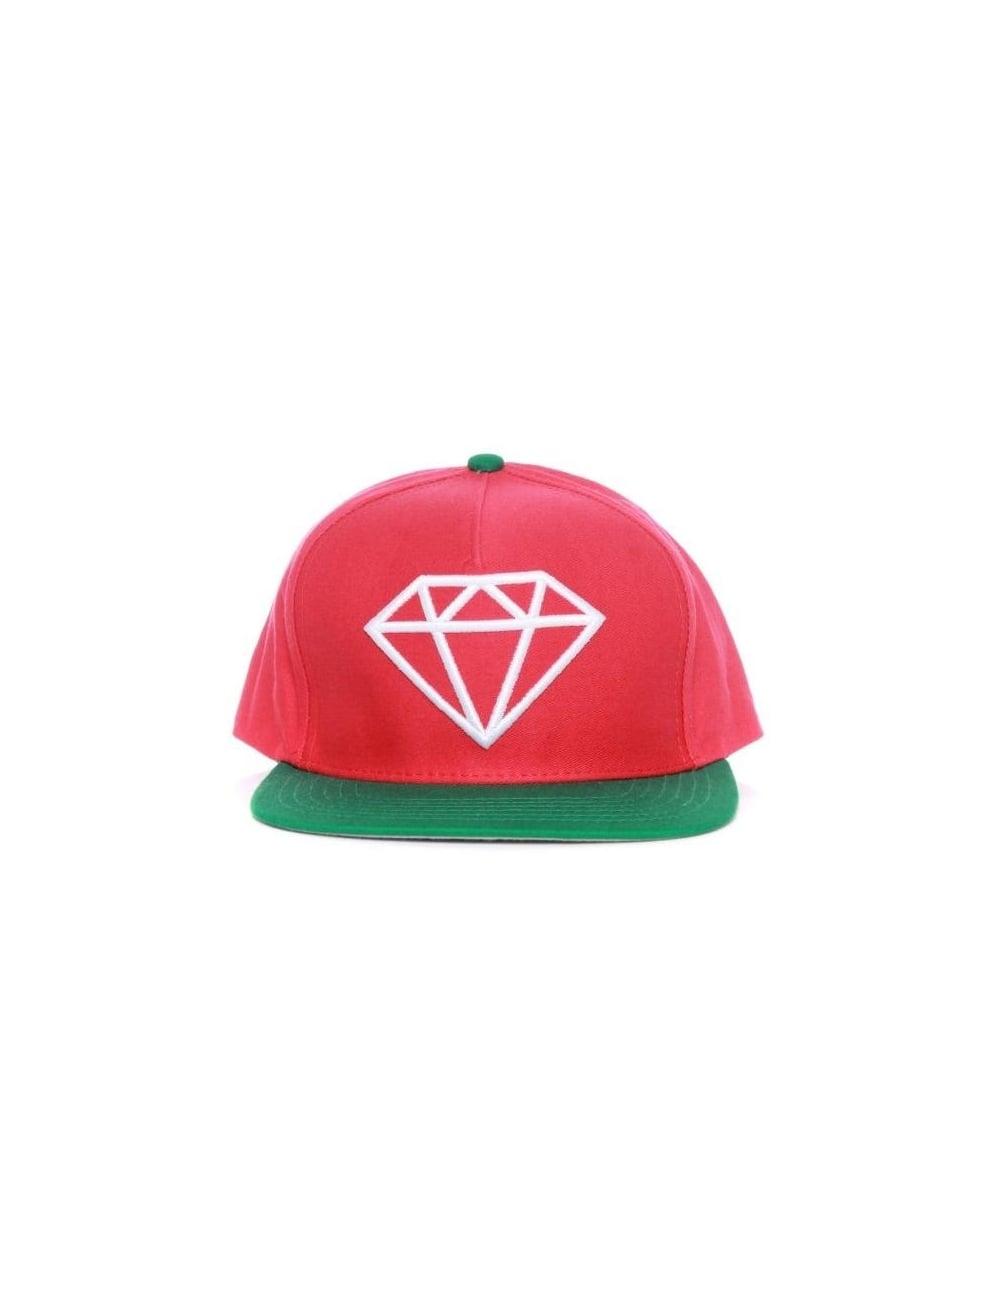 Diamond Supply Co Rock Snapback Hat - Red Green - Hat Shop from Fat ... b9adeda1724